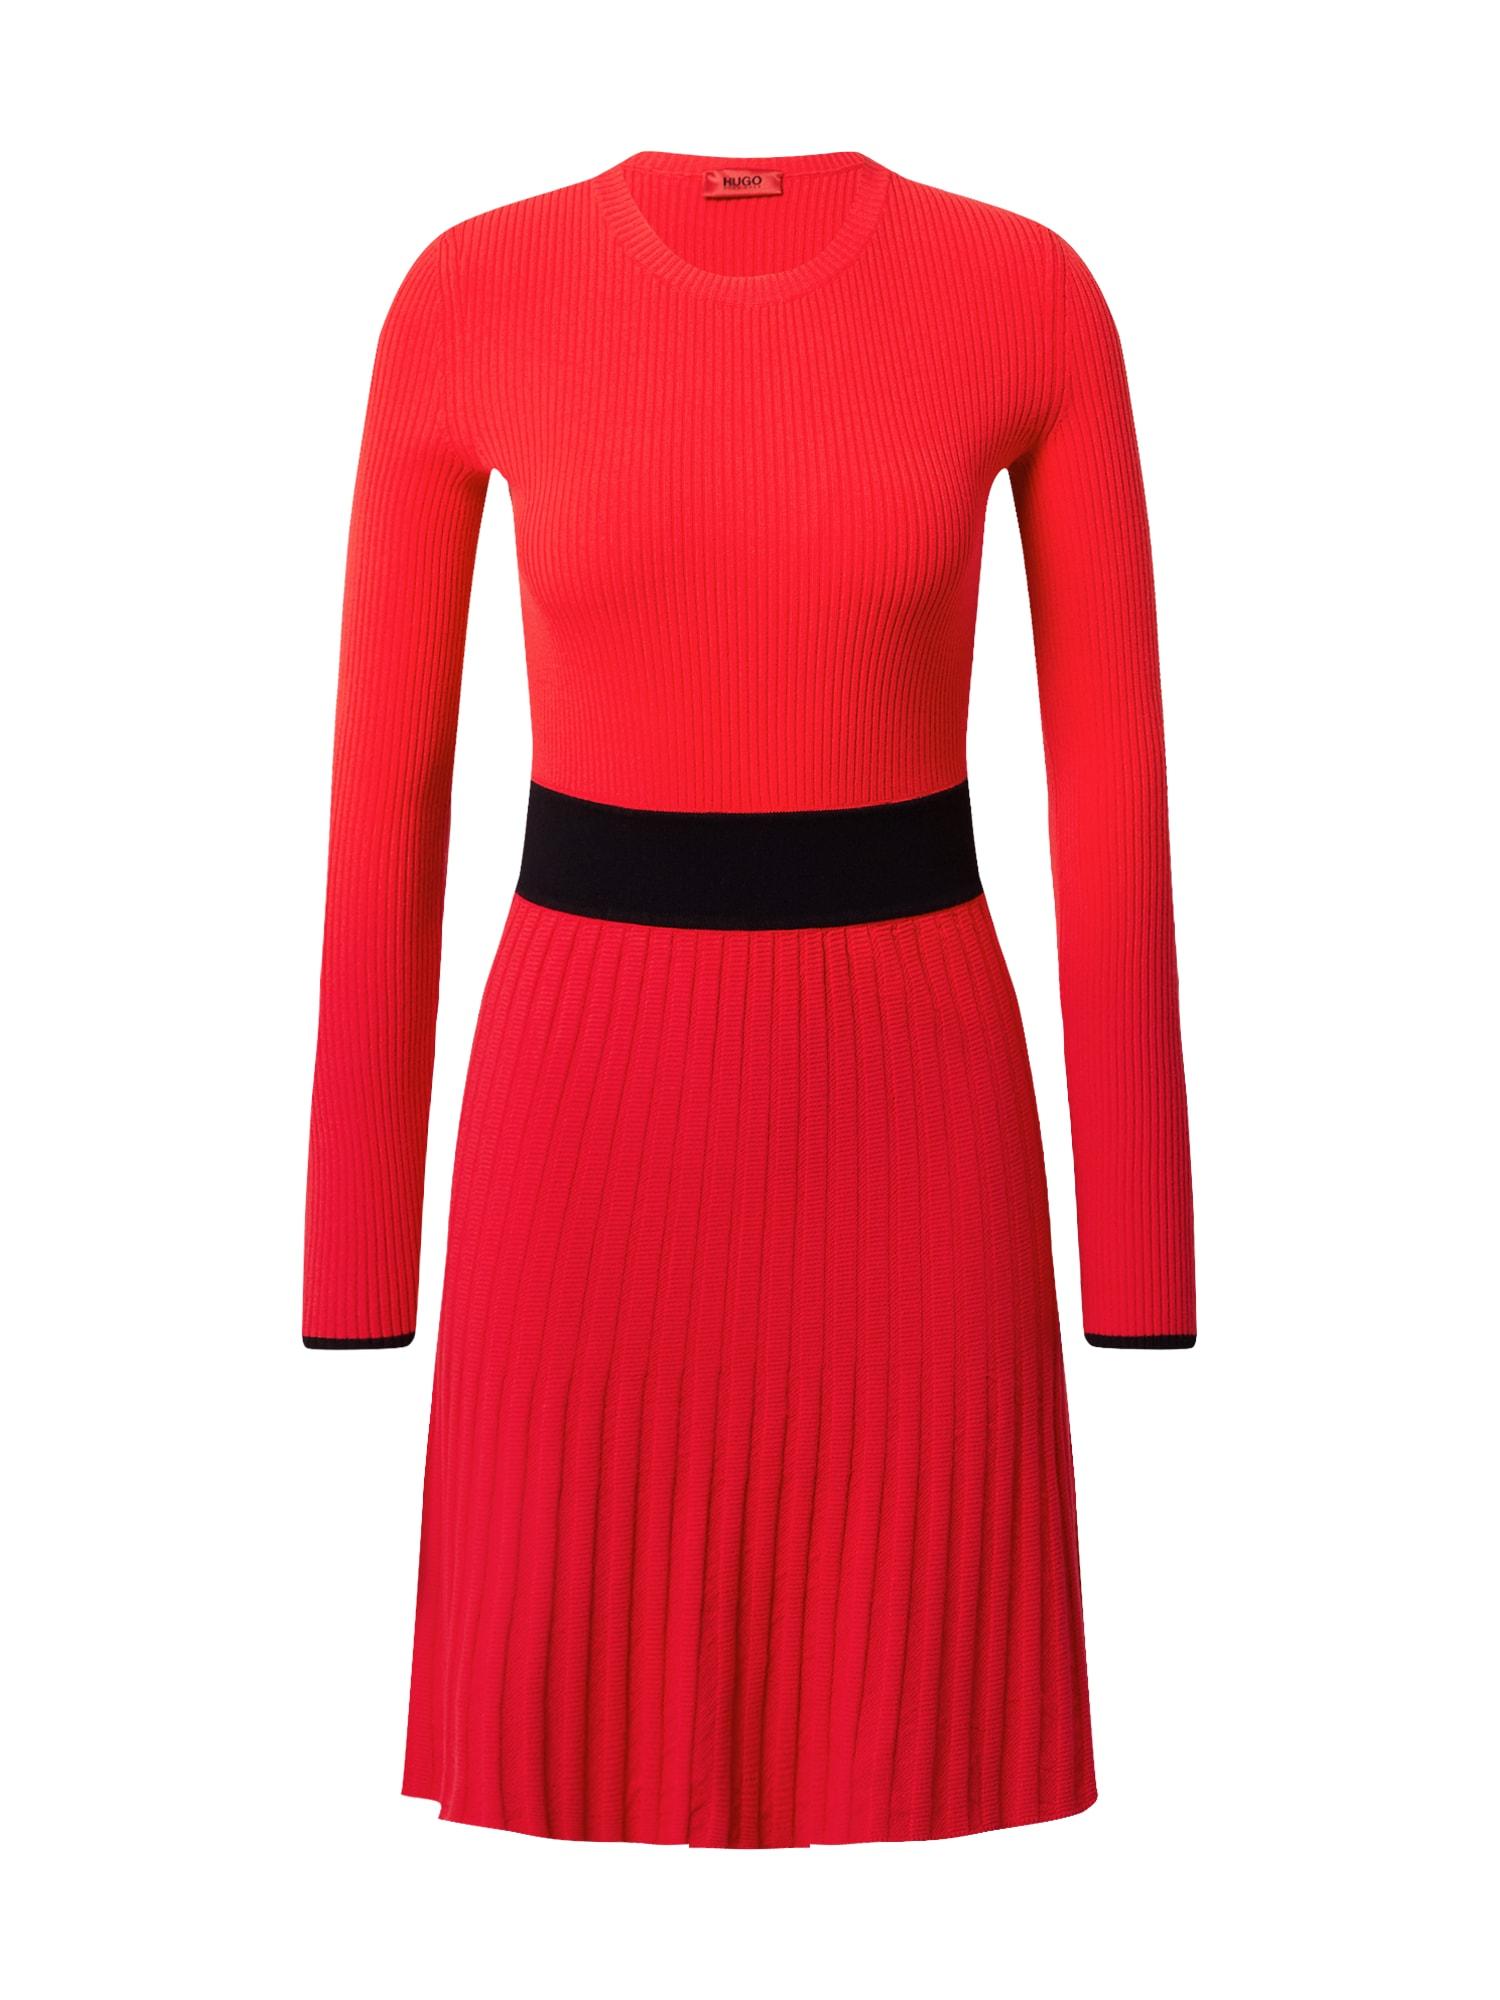 HUGO Šaty 'Seagery'  červená / černá